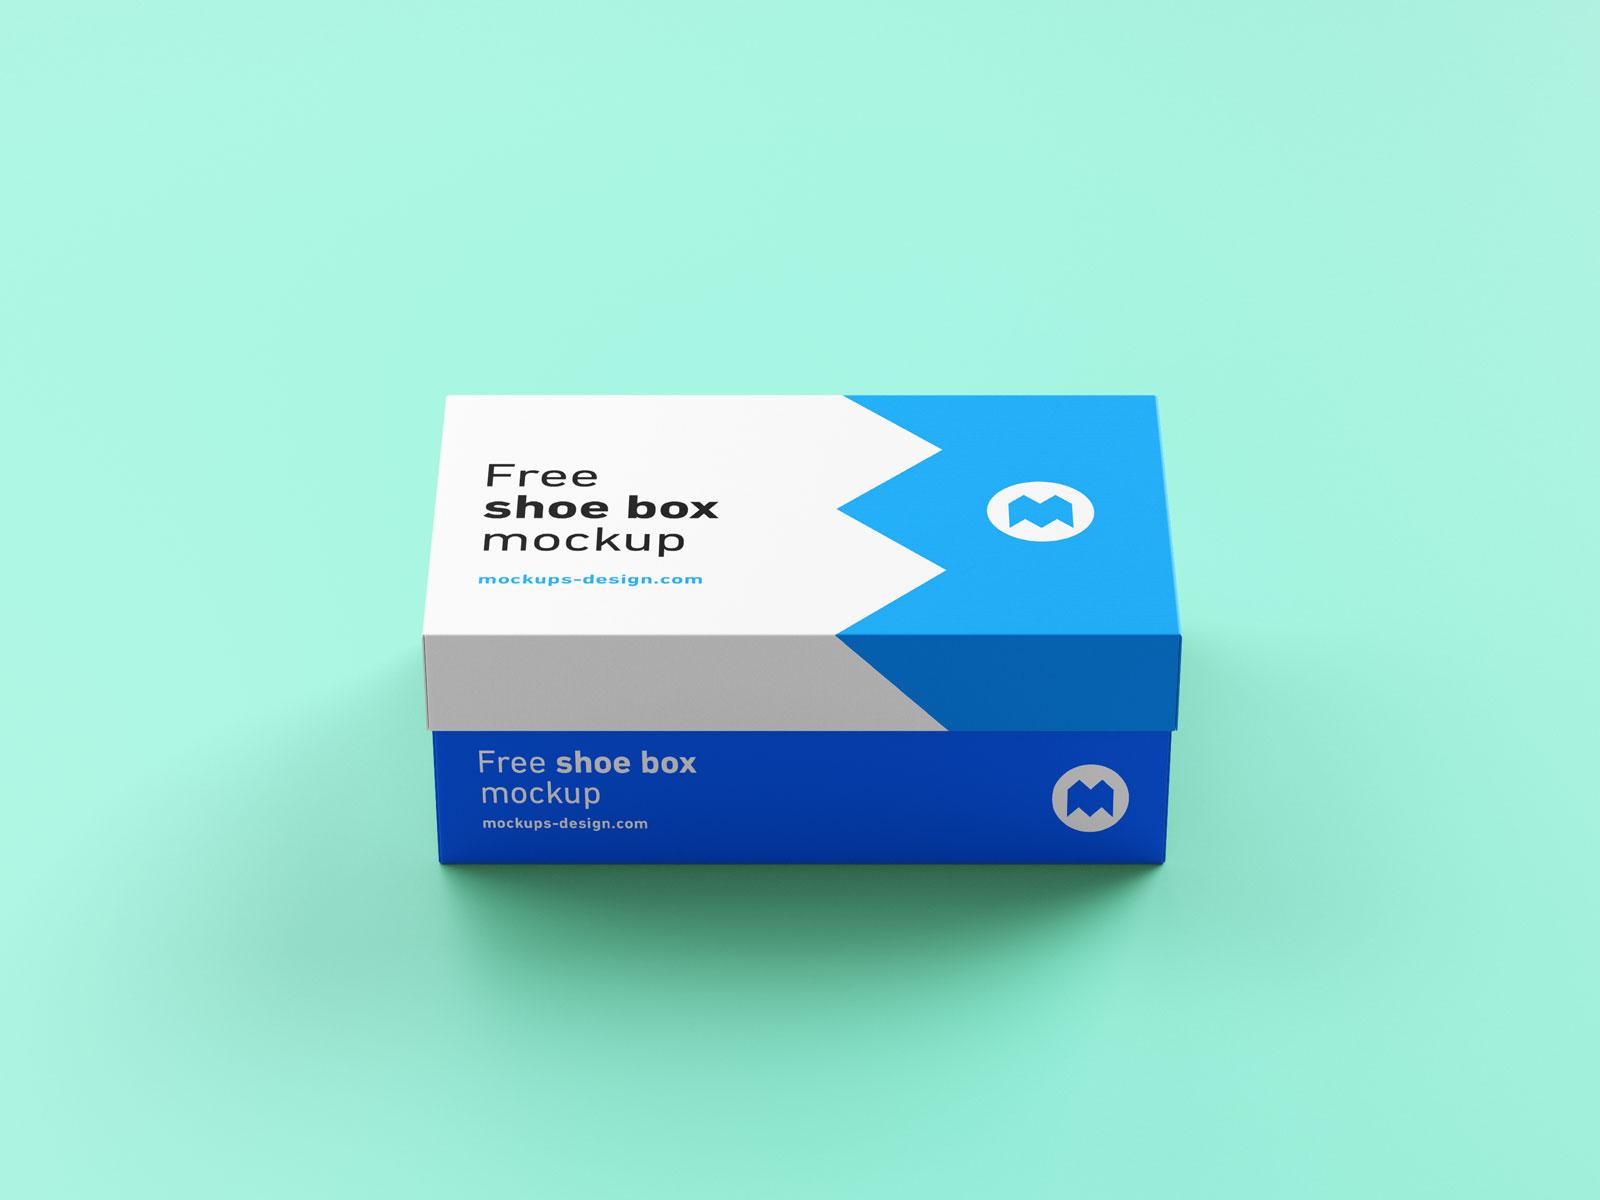 Free-Show-Box-Mockup-PSD-File-2